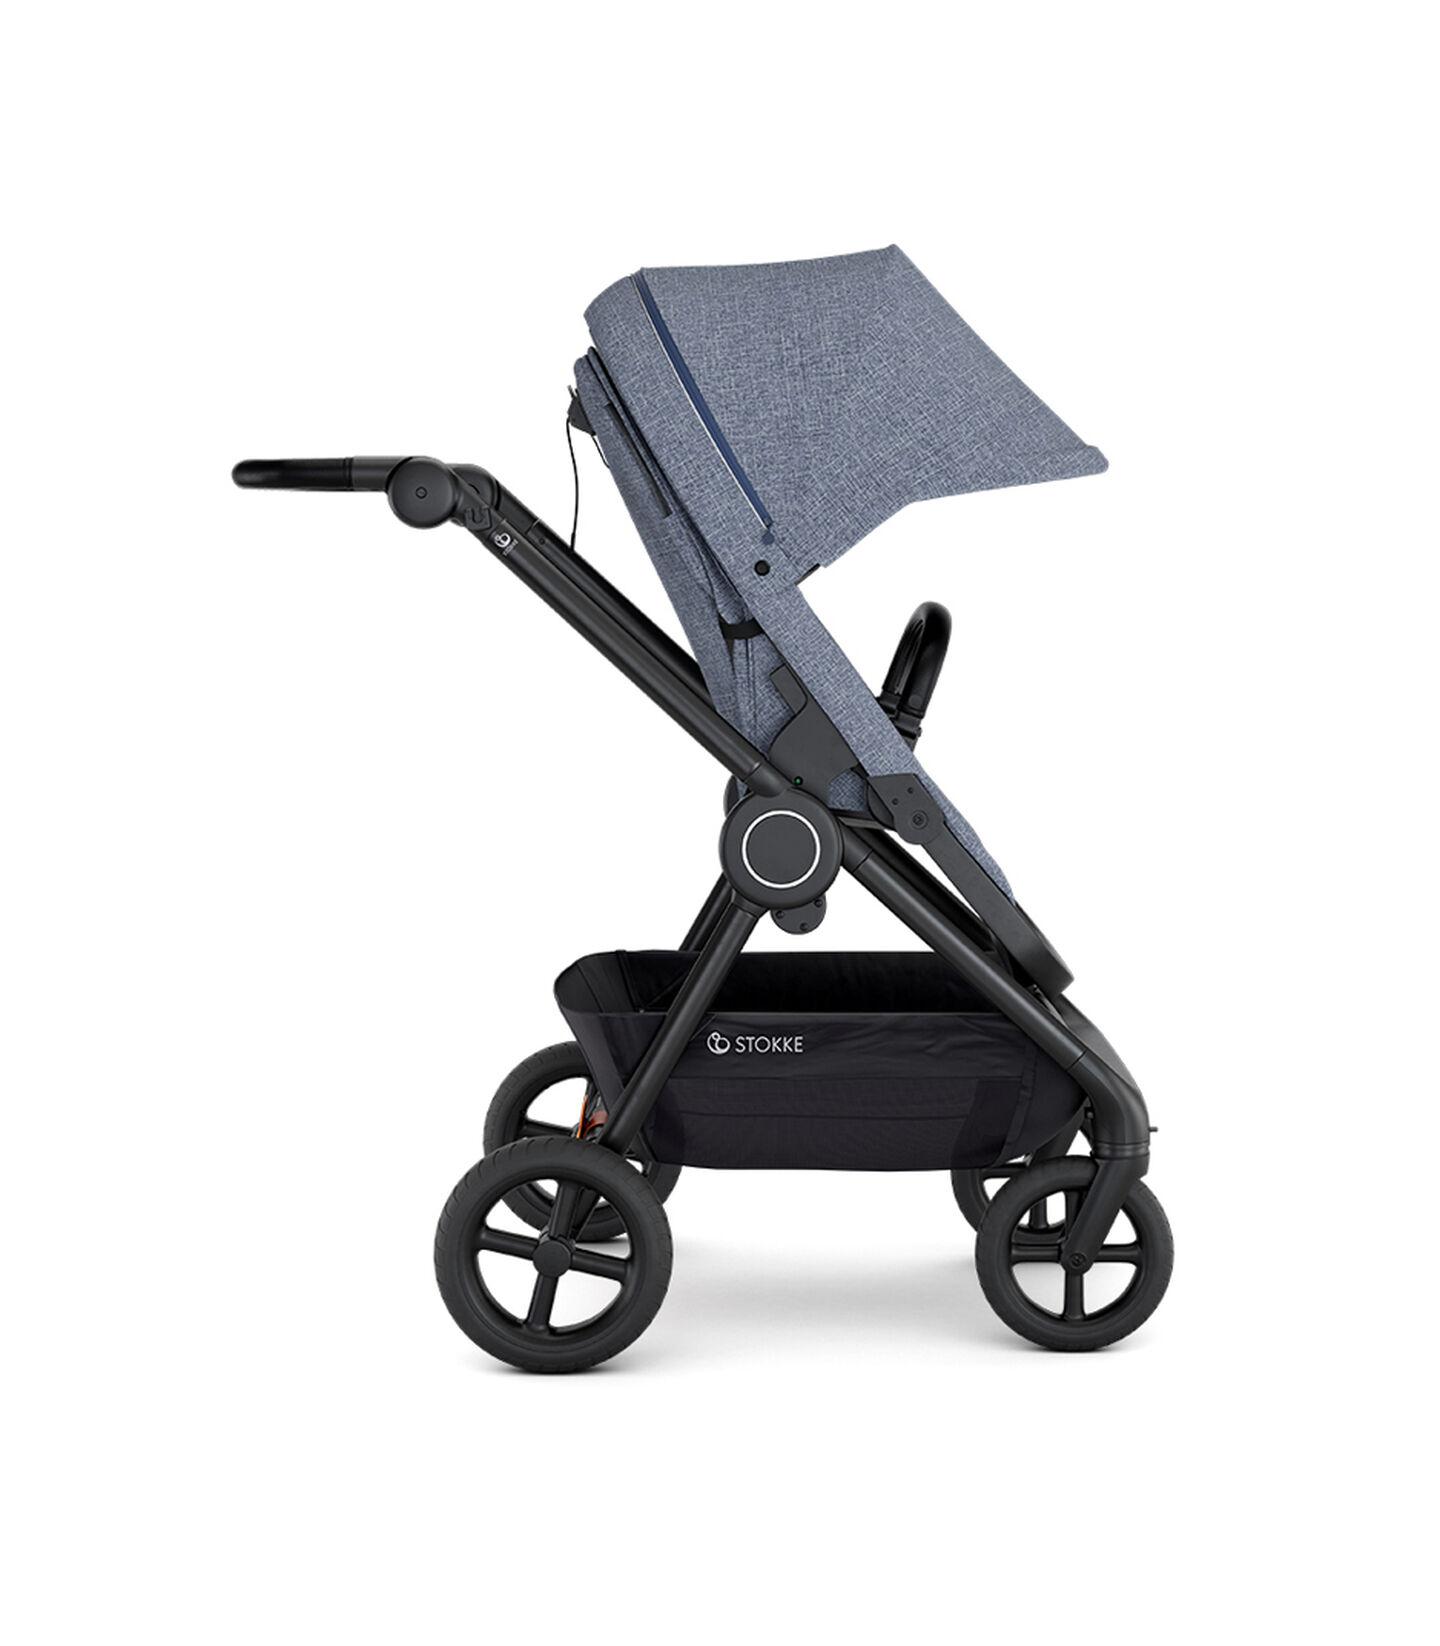 Stokke® Beat™ with Seat. Blue Melange. Forward facing.